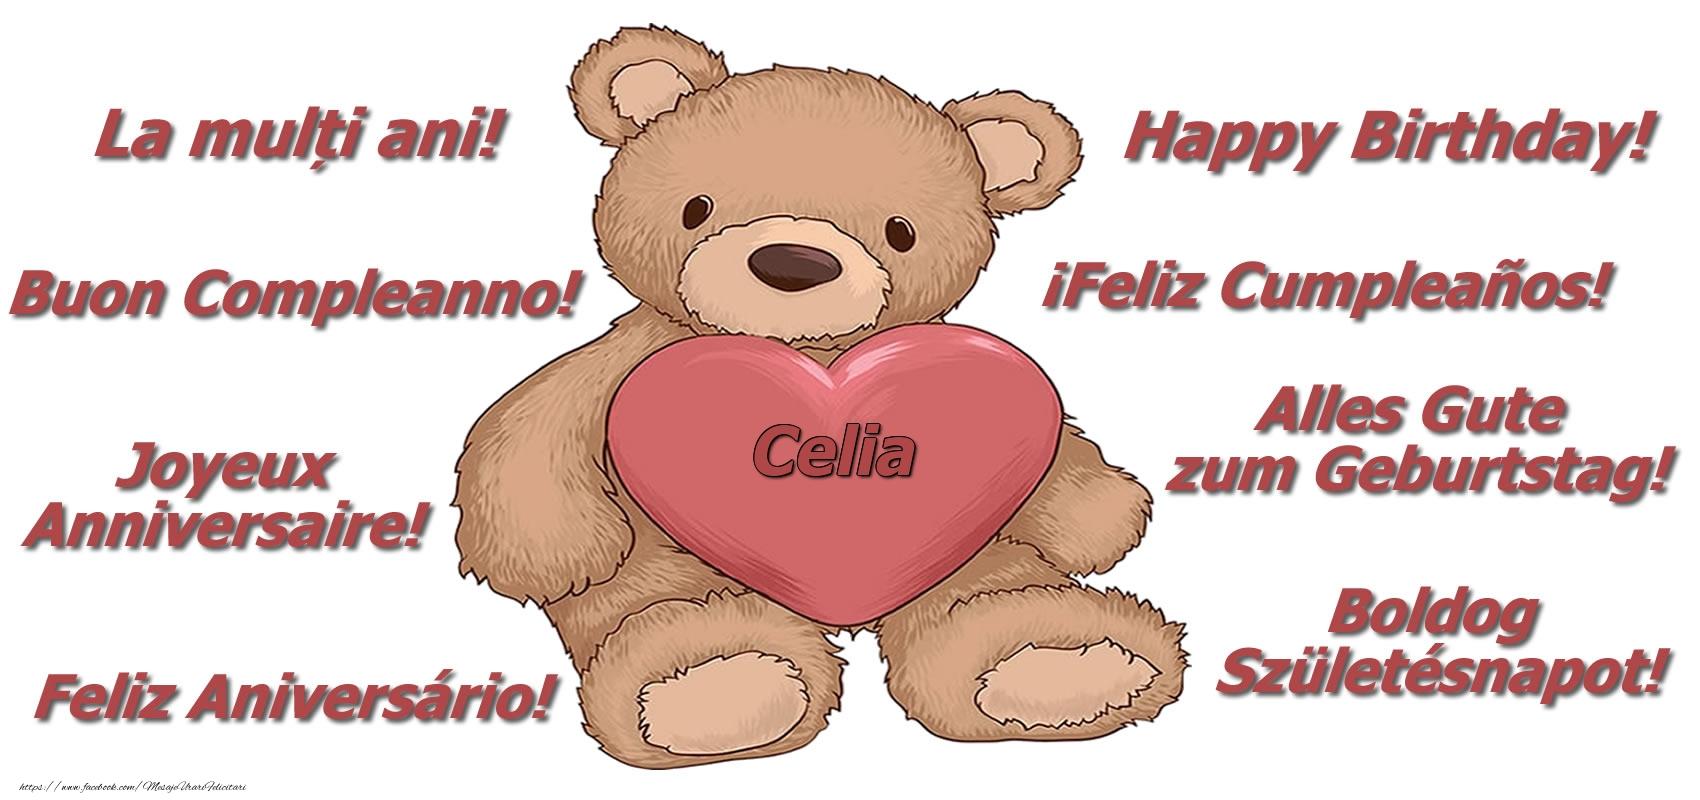 Felicitari de zi de nastere - La multi ani Celia! - Ursulet